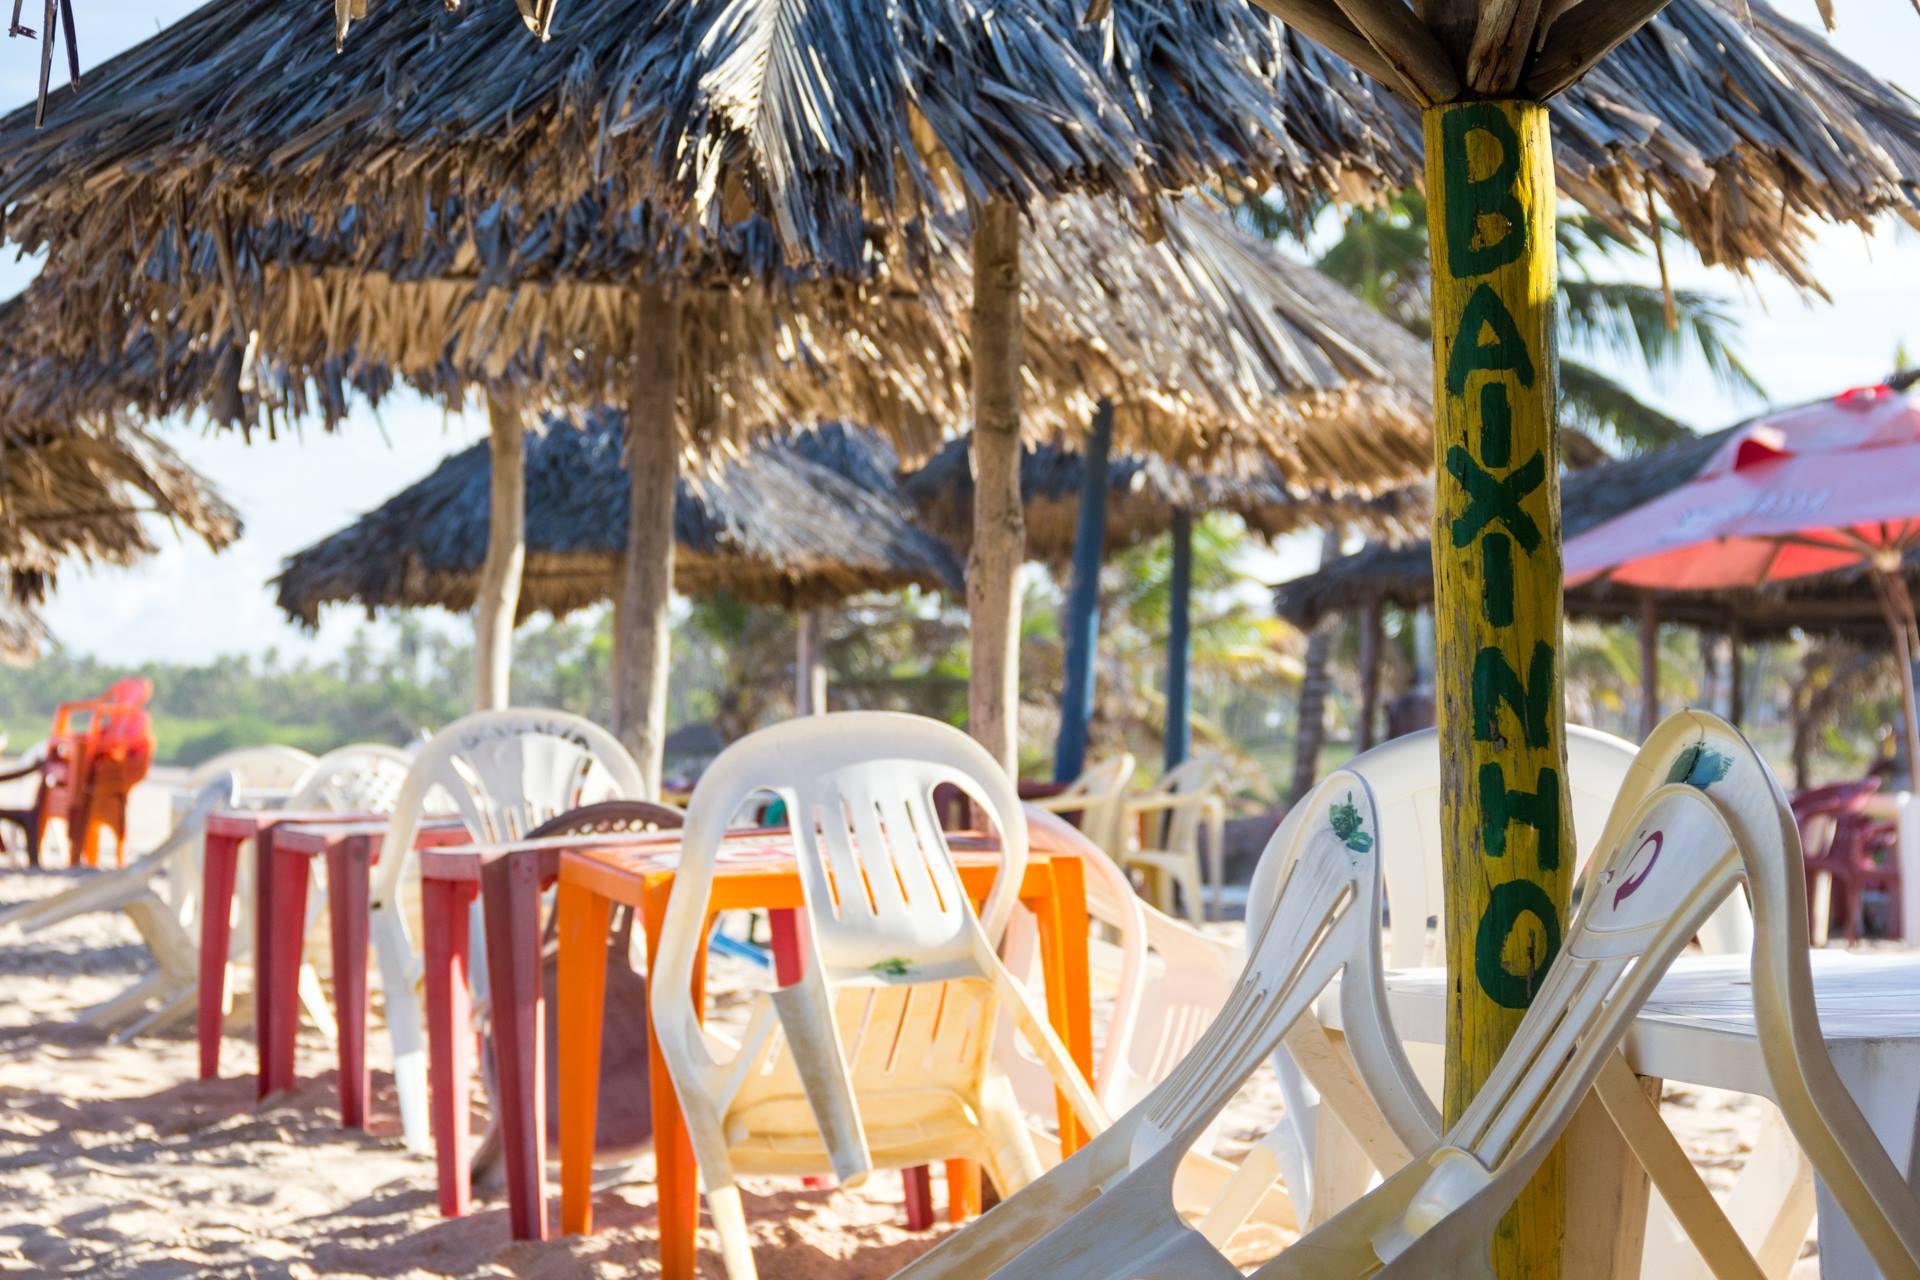 Urlaub_in_Bahia_und_Salvador4_171107170937_XR21Mv